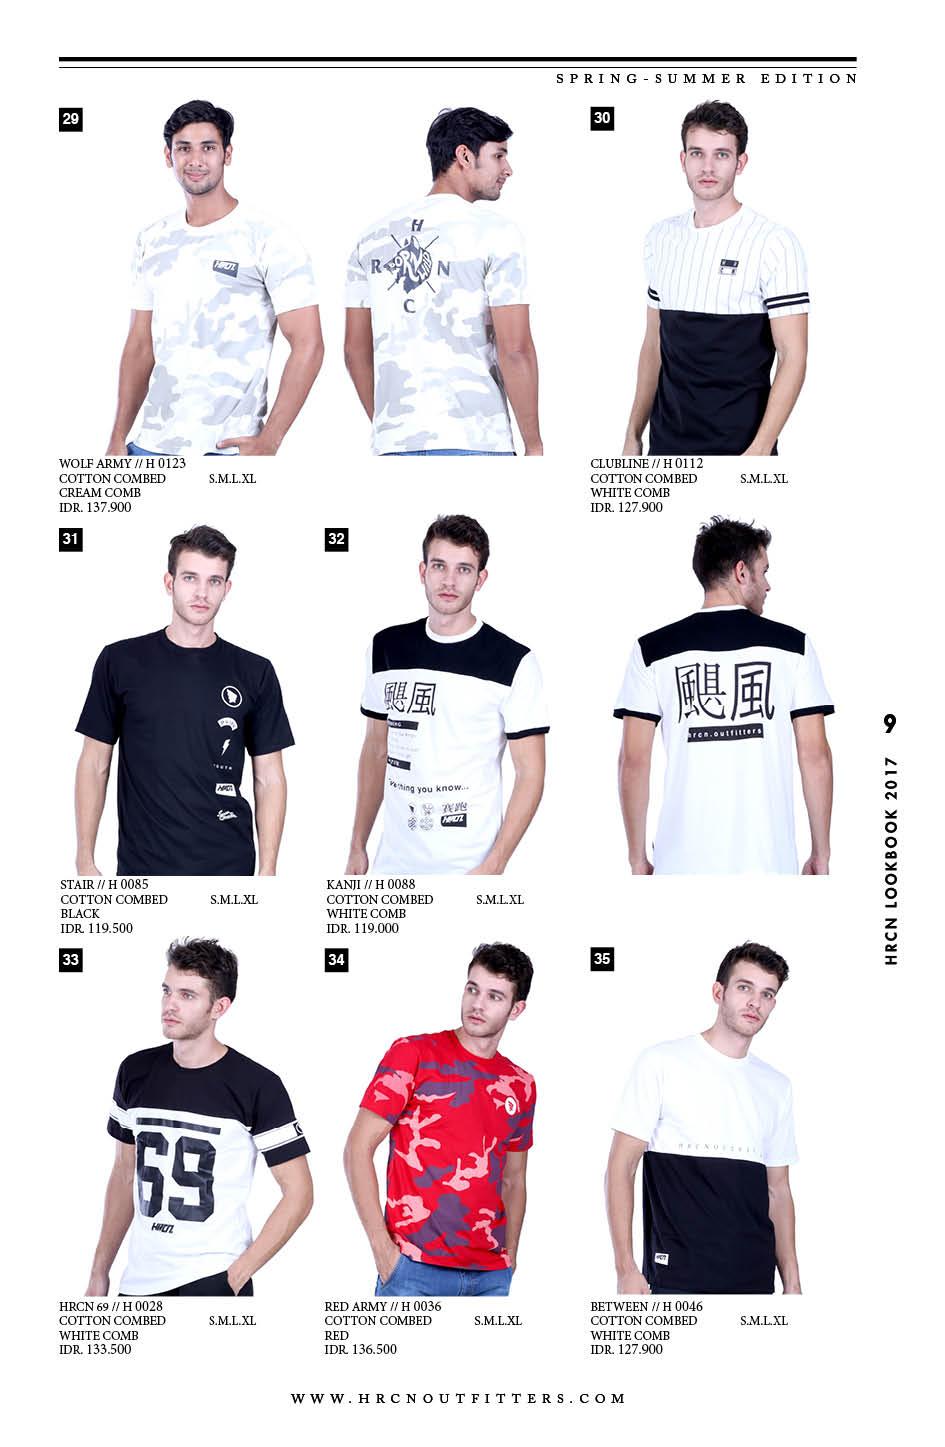 Katalog Terbaru Hrcn 2016 2017 Kaos Casual Pria Distro H 0046